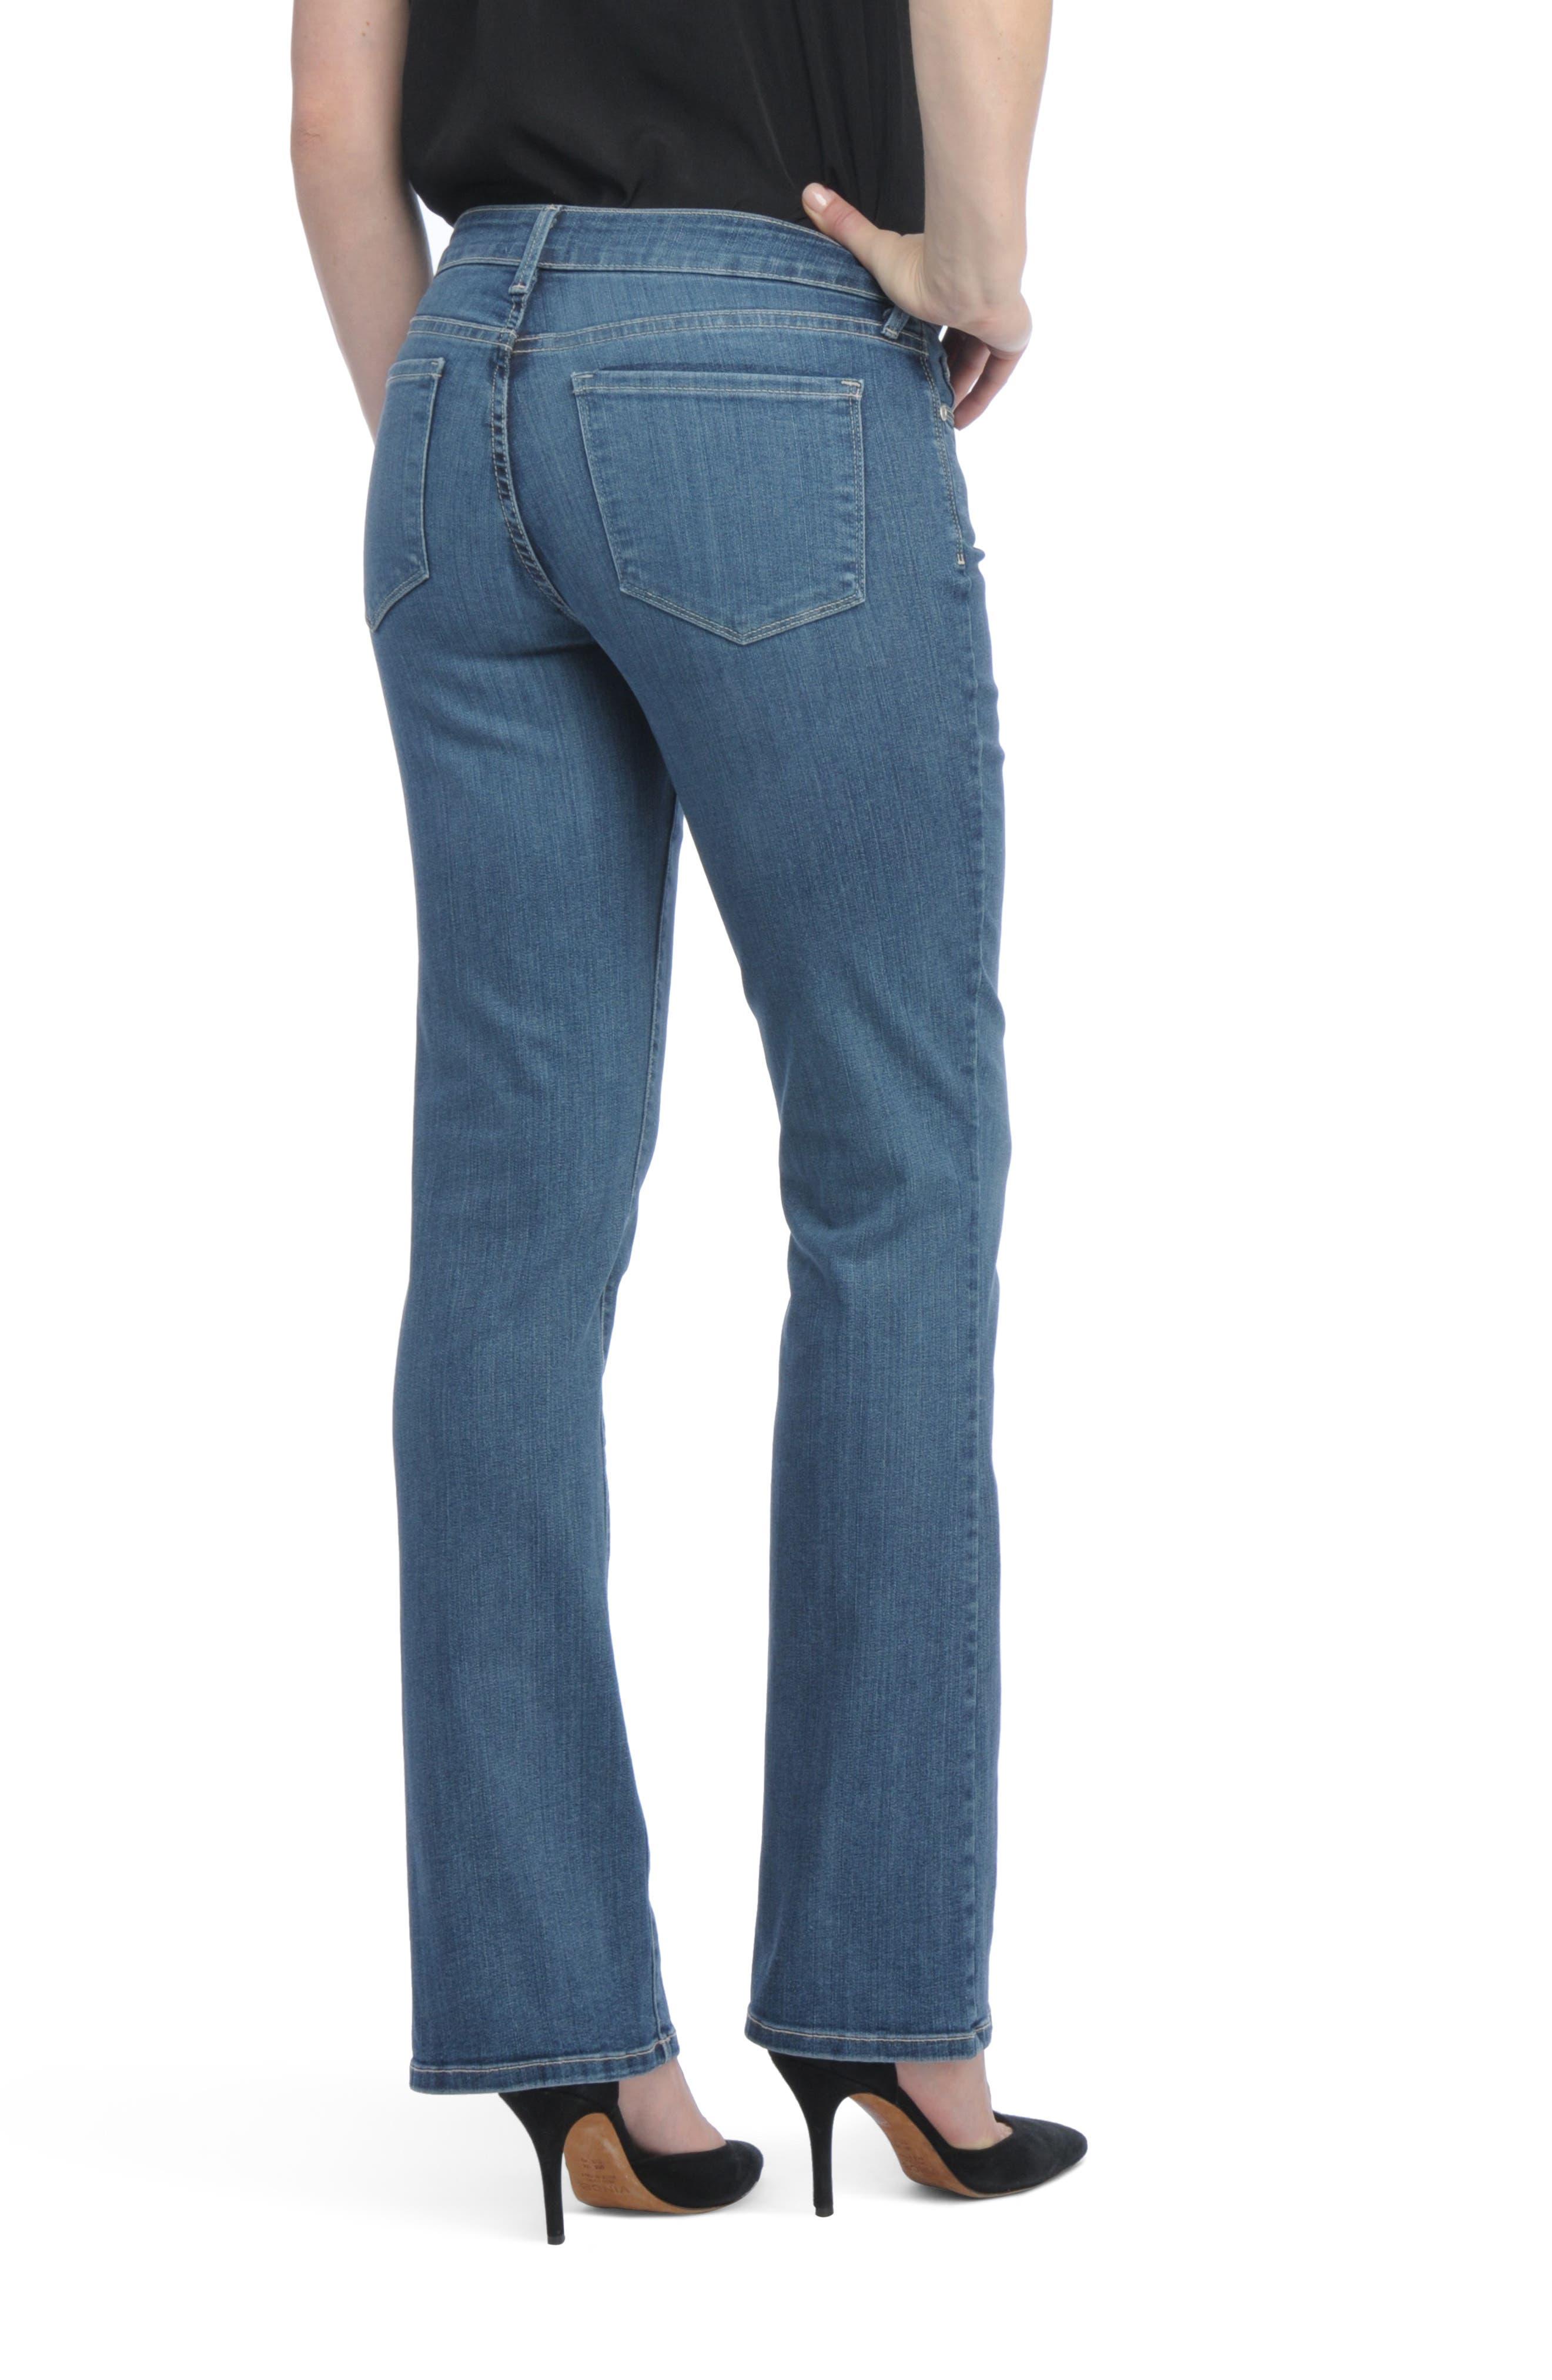 Barbara Bootcut Short Jeans,                             Alternate thumbnail 2, color,                             421